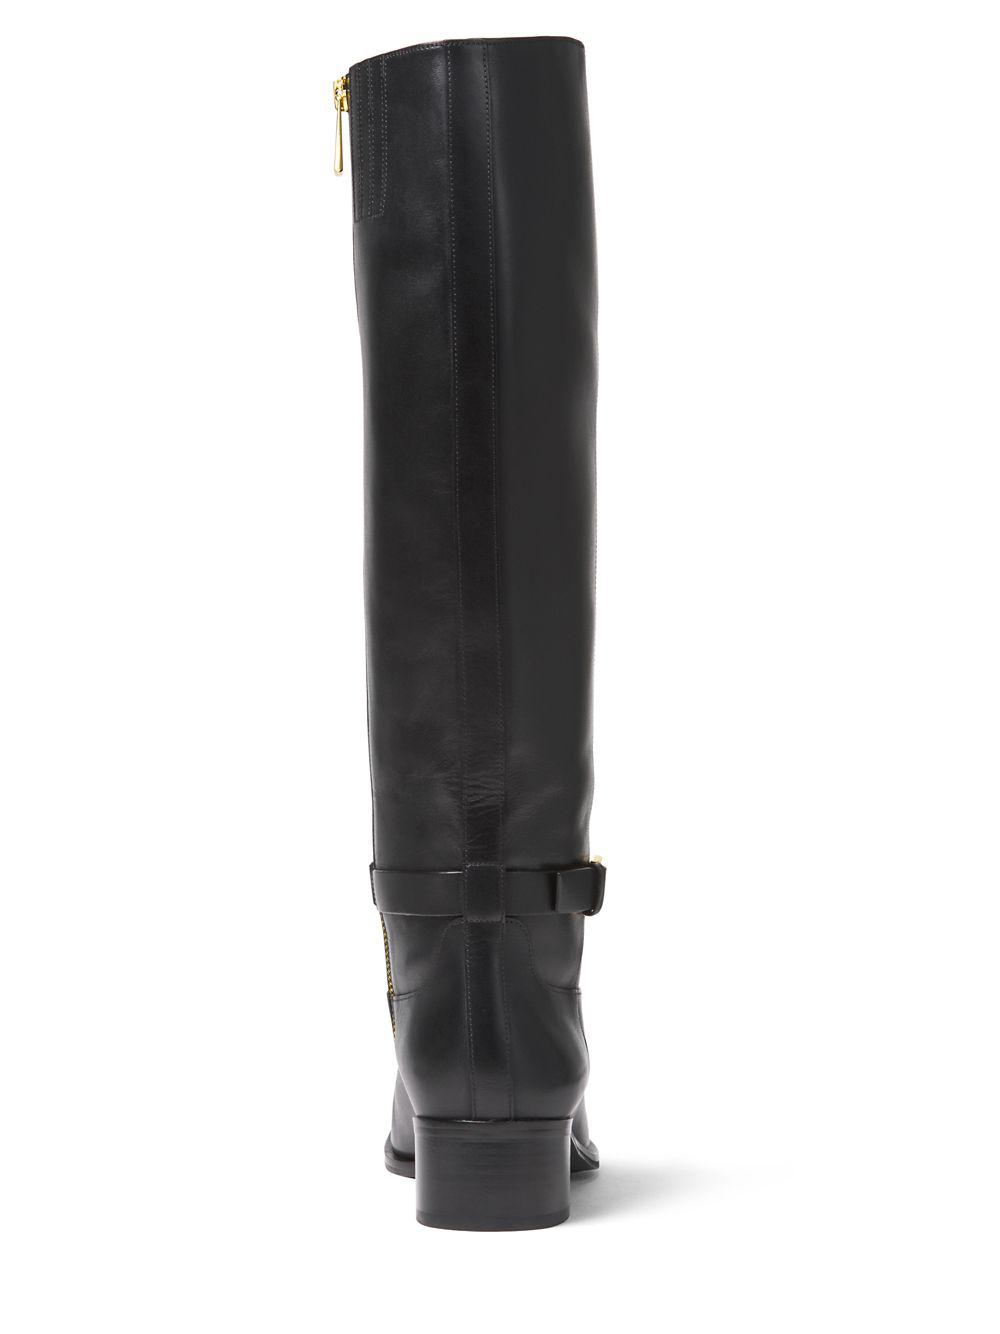 9a9b25cb21f4 Lyst - MICHAEL Michael Kors Heather Tall Leather Boots in Black